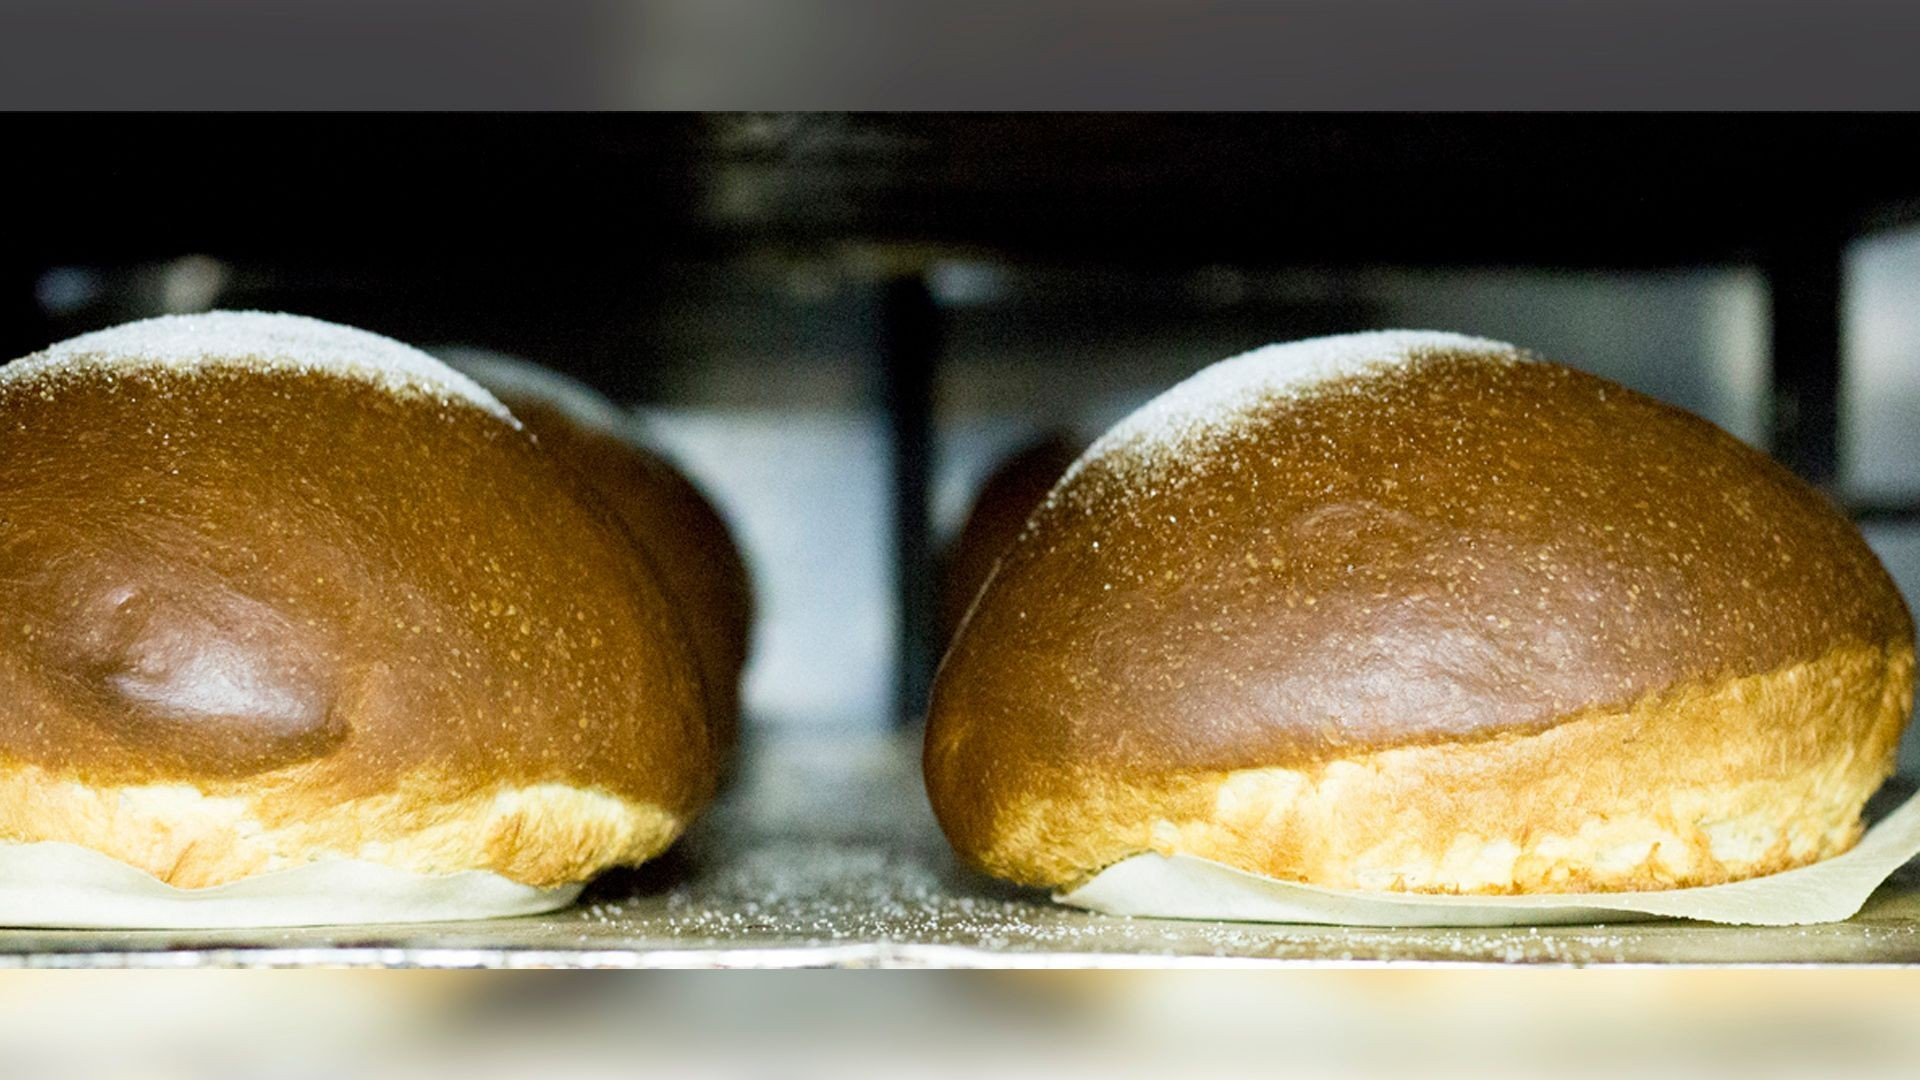 Pastelería artesanal en Onil